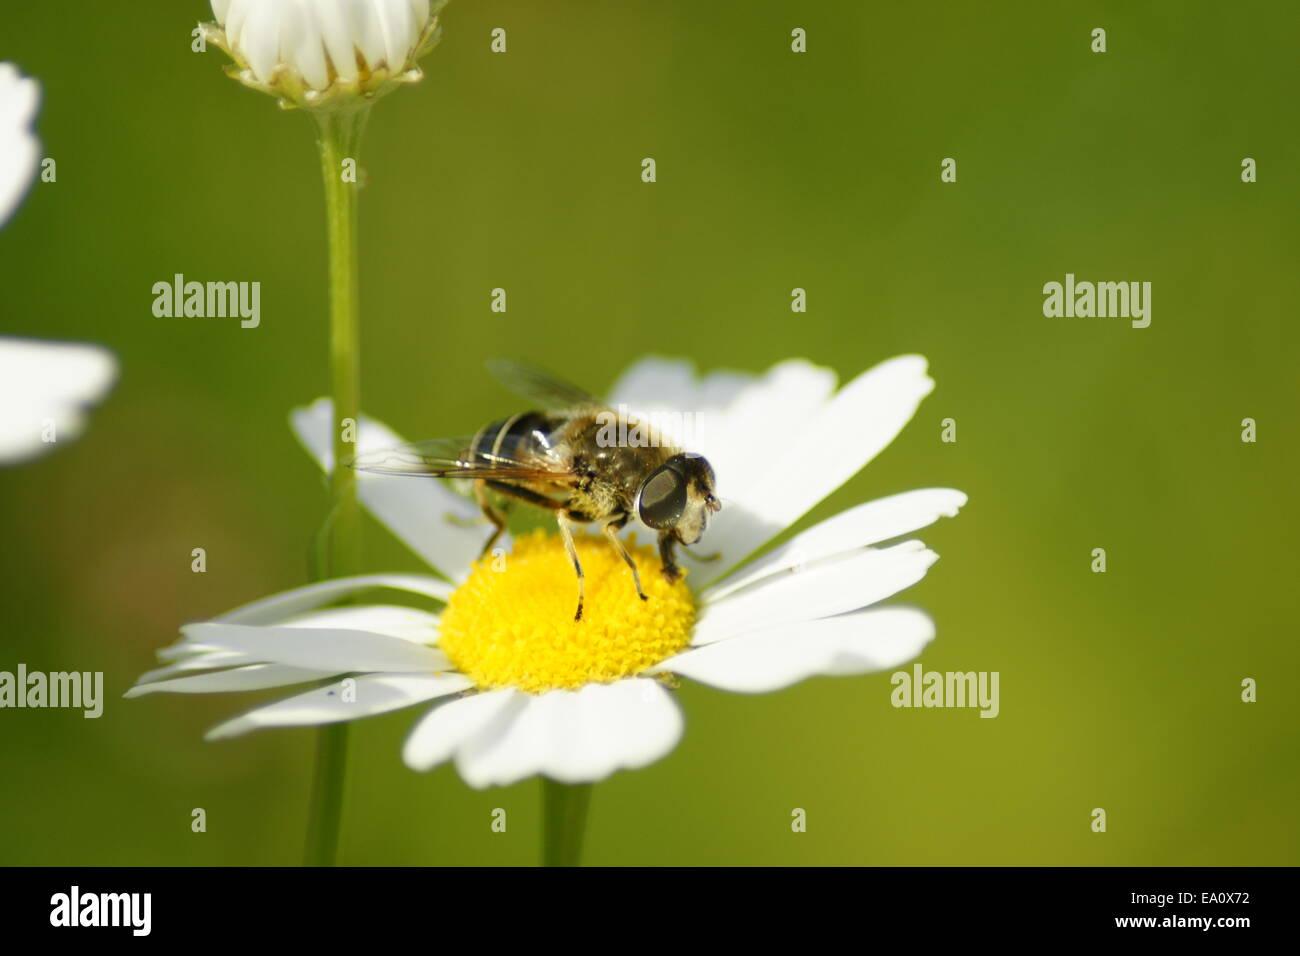 Flower fly on a white marguerite blossom - Stock Image